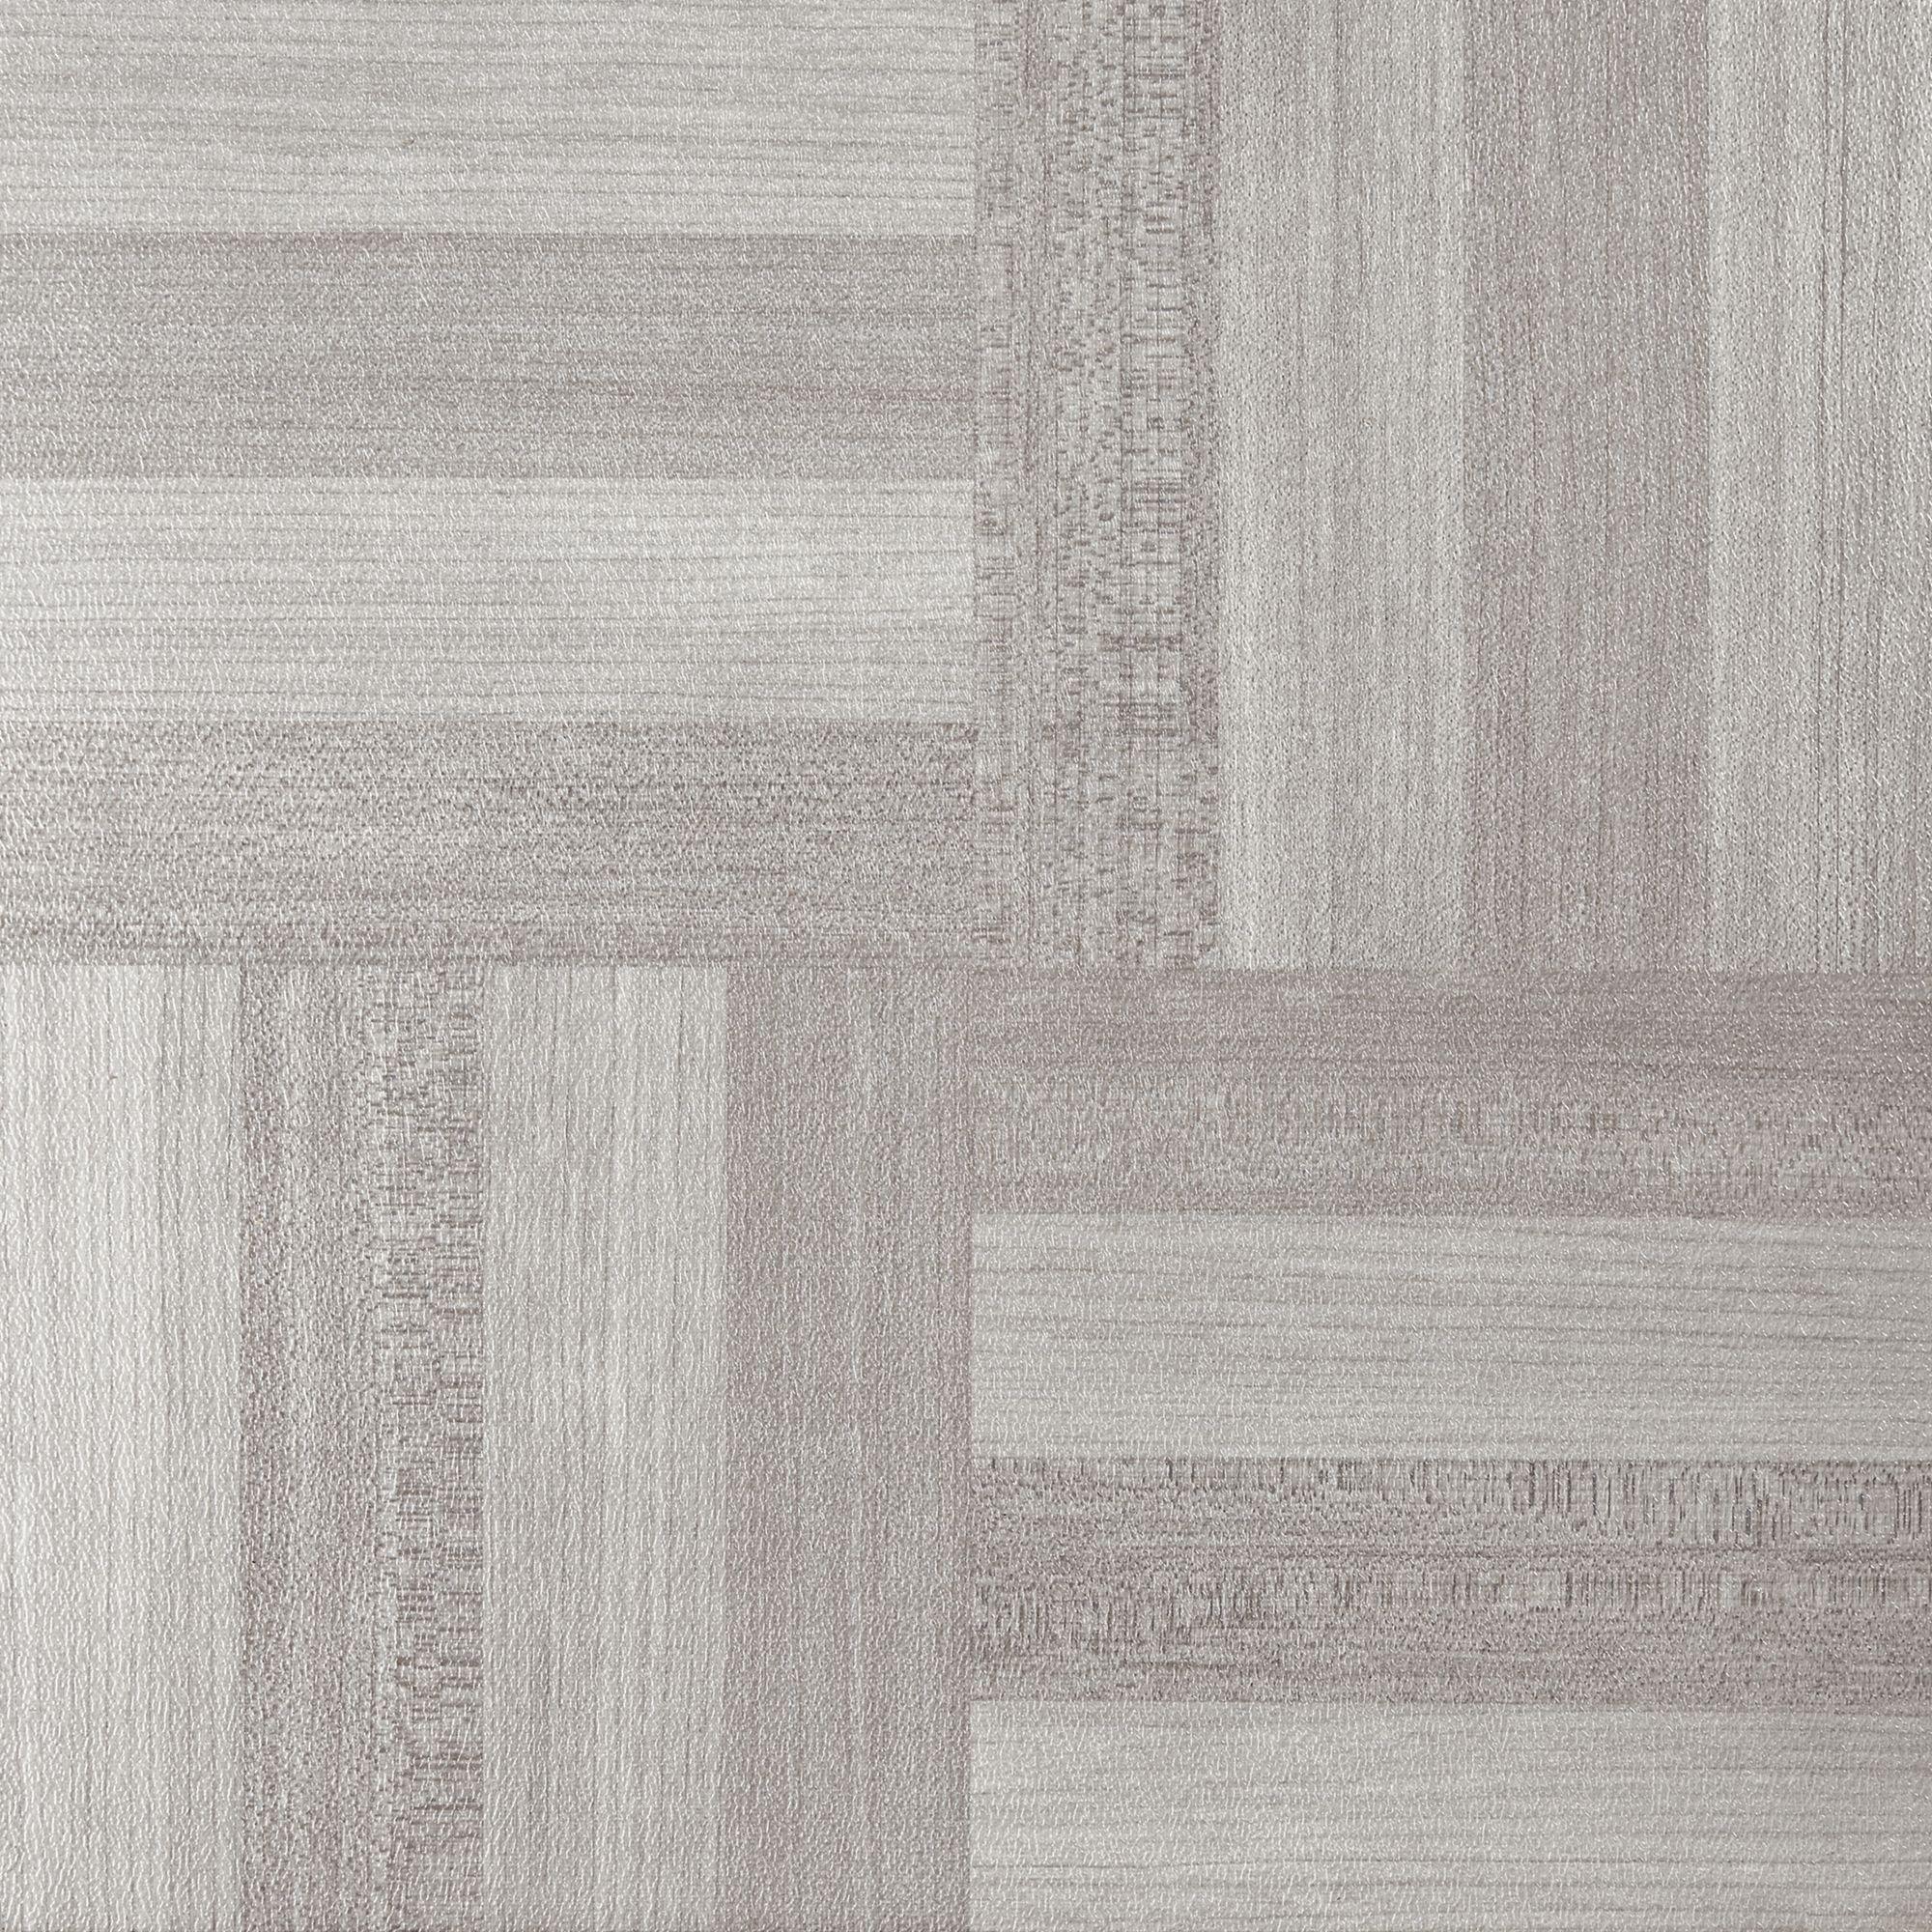 Achim tivoli ash grey wood 12x12 self adhesive vinyl floor tile 45 achim tivoli ash grey wood 12x12 self adhesive vinyl floor tile 45 tiles 45 dailygadgetfo Image collections